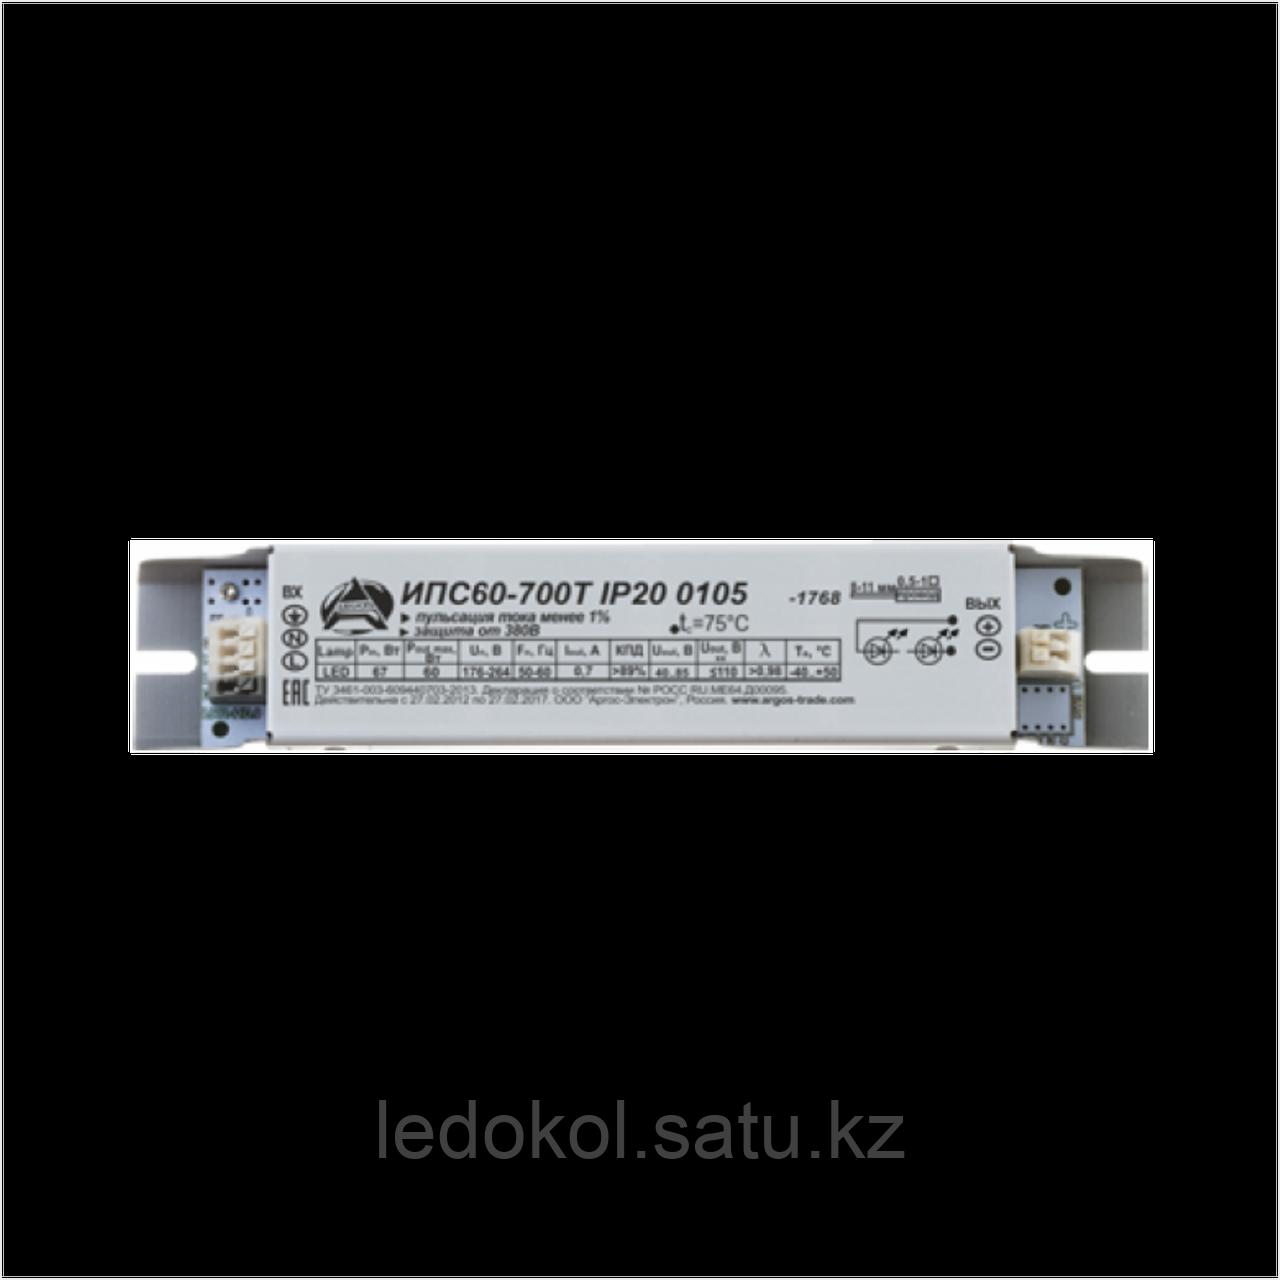 Источник питания Аргос ИПС60-1050ТД (750-1050) IP20 0105